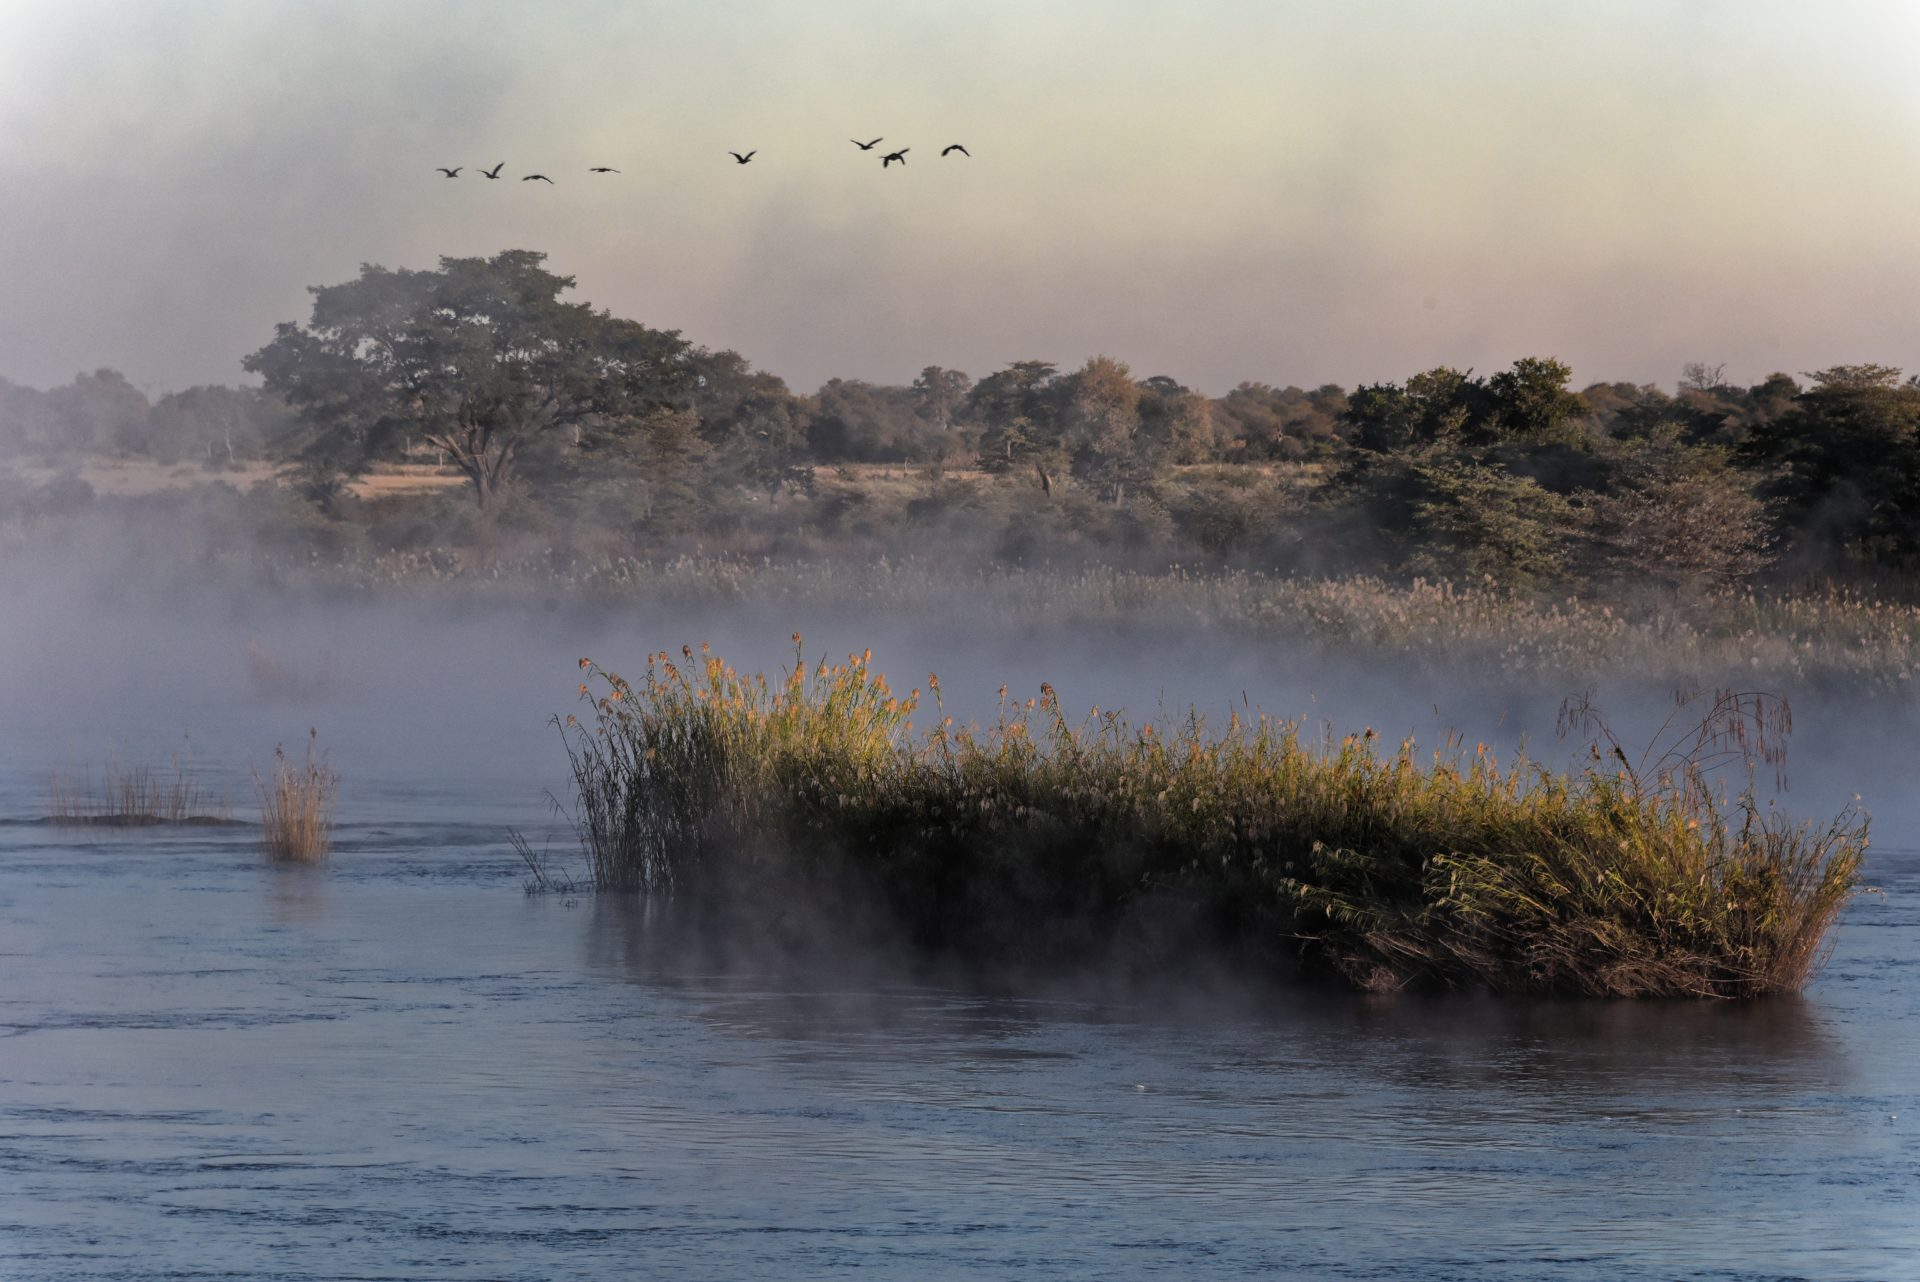 Cubango River - RIVERDANCE LODGE - Namibia